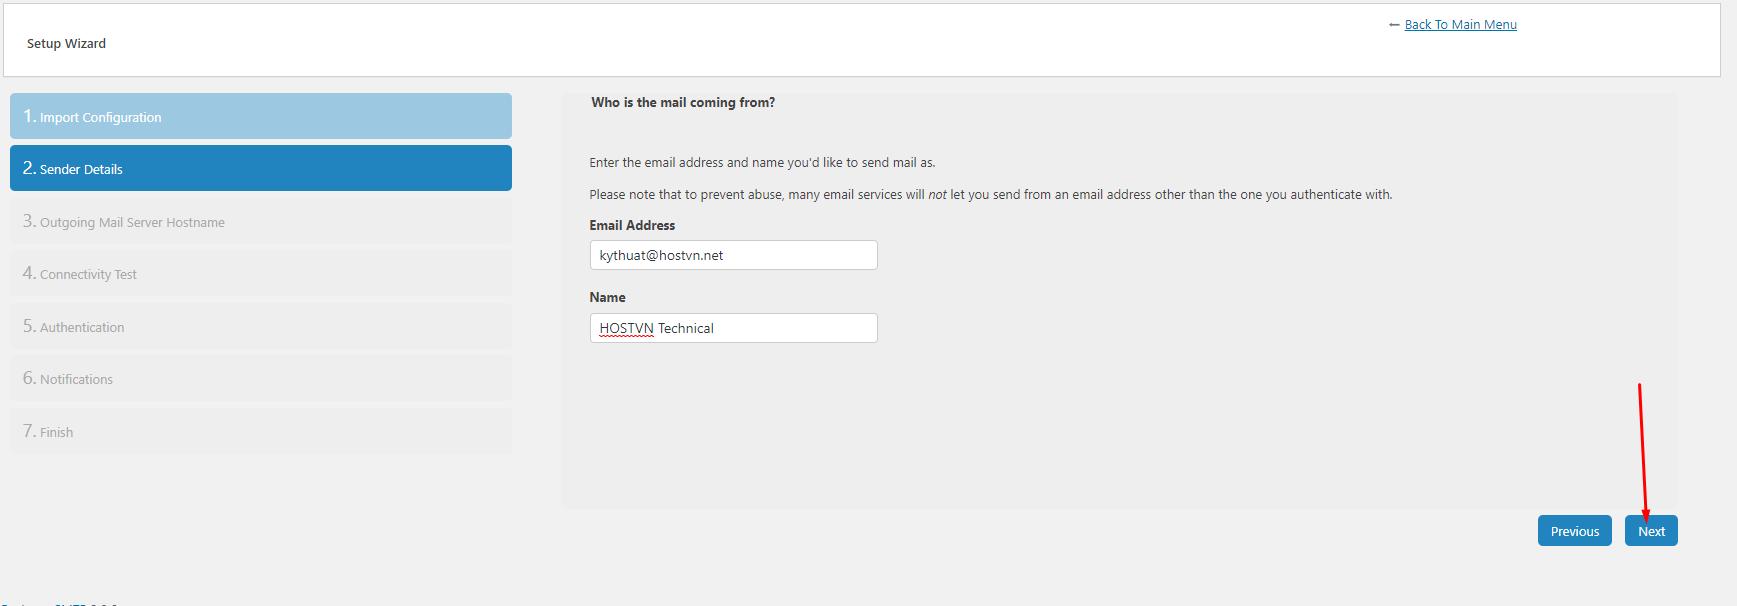 setting Email Address